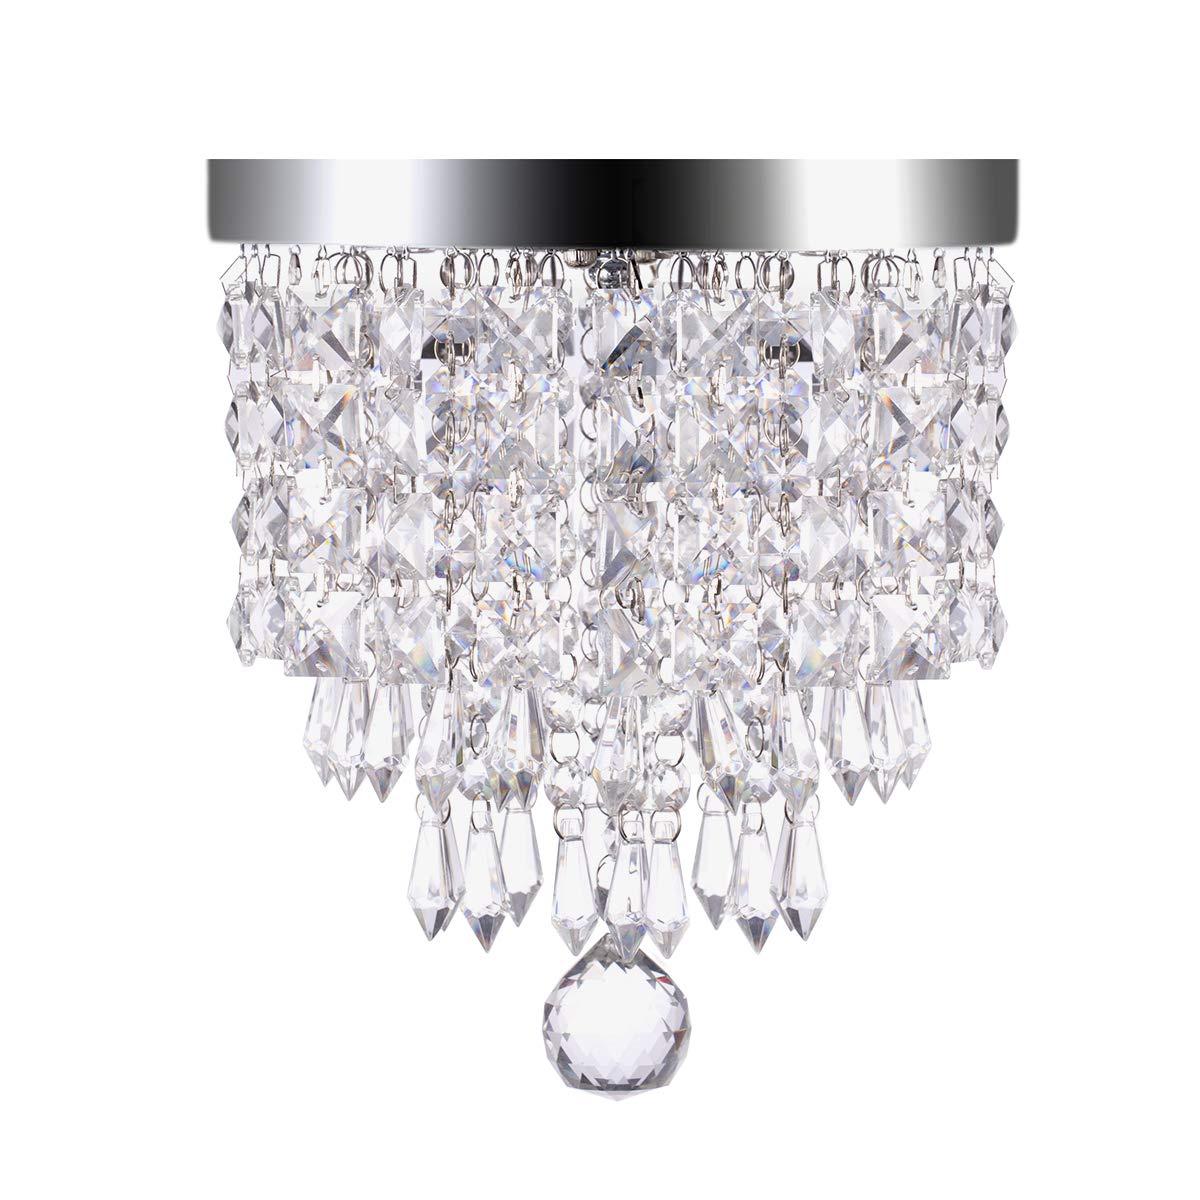 LOHAS Crystal Chandelier Lighting, 100 Watt Equivalent, 15W Multicolor Ceiling Lamp, Smart Wifi Light Bulb, 8.66'' Chandeliers Lighting Fixture, 1380LM Modern Pedant Light, Works with Alexa, 1 Pack